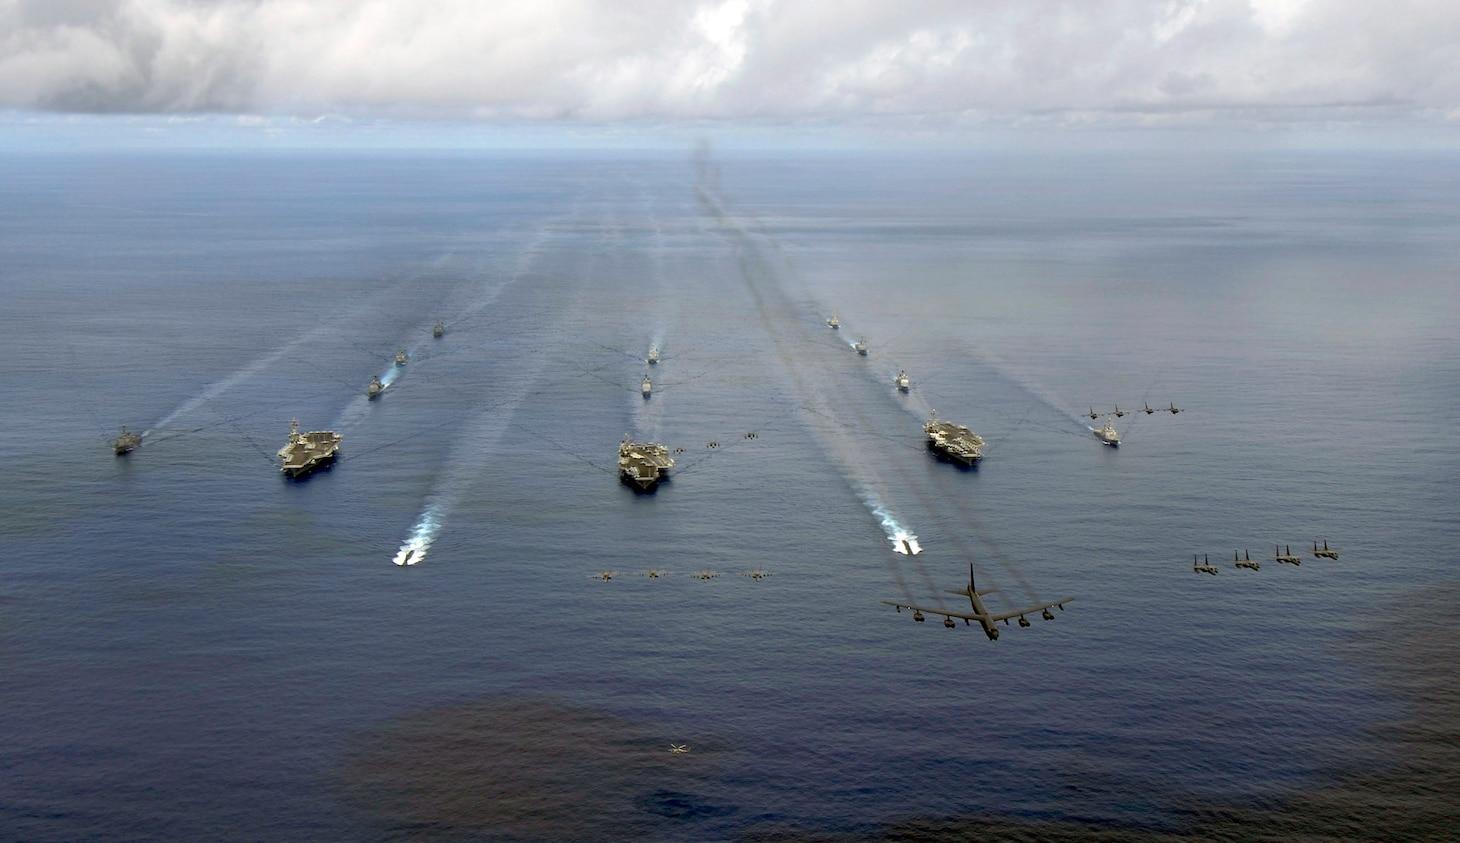 File photo: USS KITTY HAWK, at sea (Aug.14, 2007) - USS Nimitz (CVN 68), USS Kitty Hawk (CV 63), and USS John C. Stennis (CVN 74) carrier strike groups steam in formation during a joint photo exercise (PHOTOEX) during exercise Valiant Shield 2007 Aug.14.